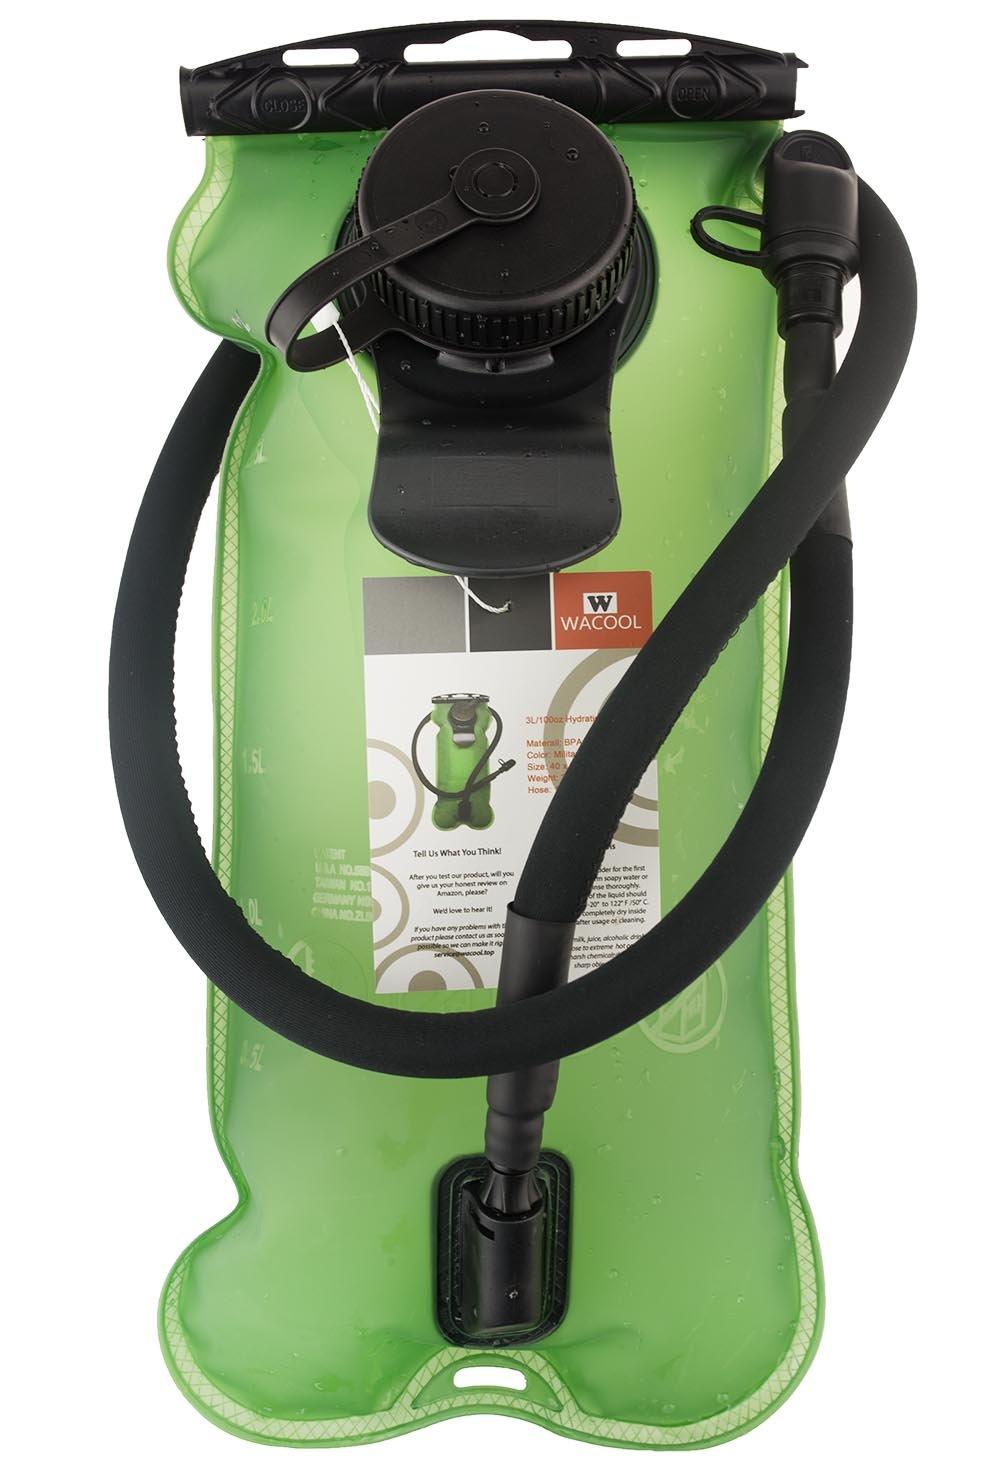 WACOOL 3L 3Liter 100oz BPA Free EVA Hydration Pack Bladder, Leak-Proof Water Reservoir (Green(Double Opening)) by WACOOL